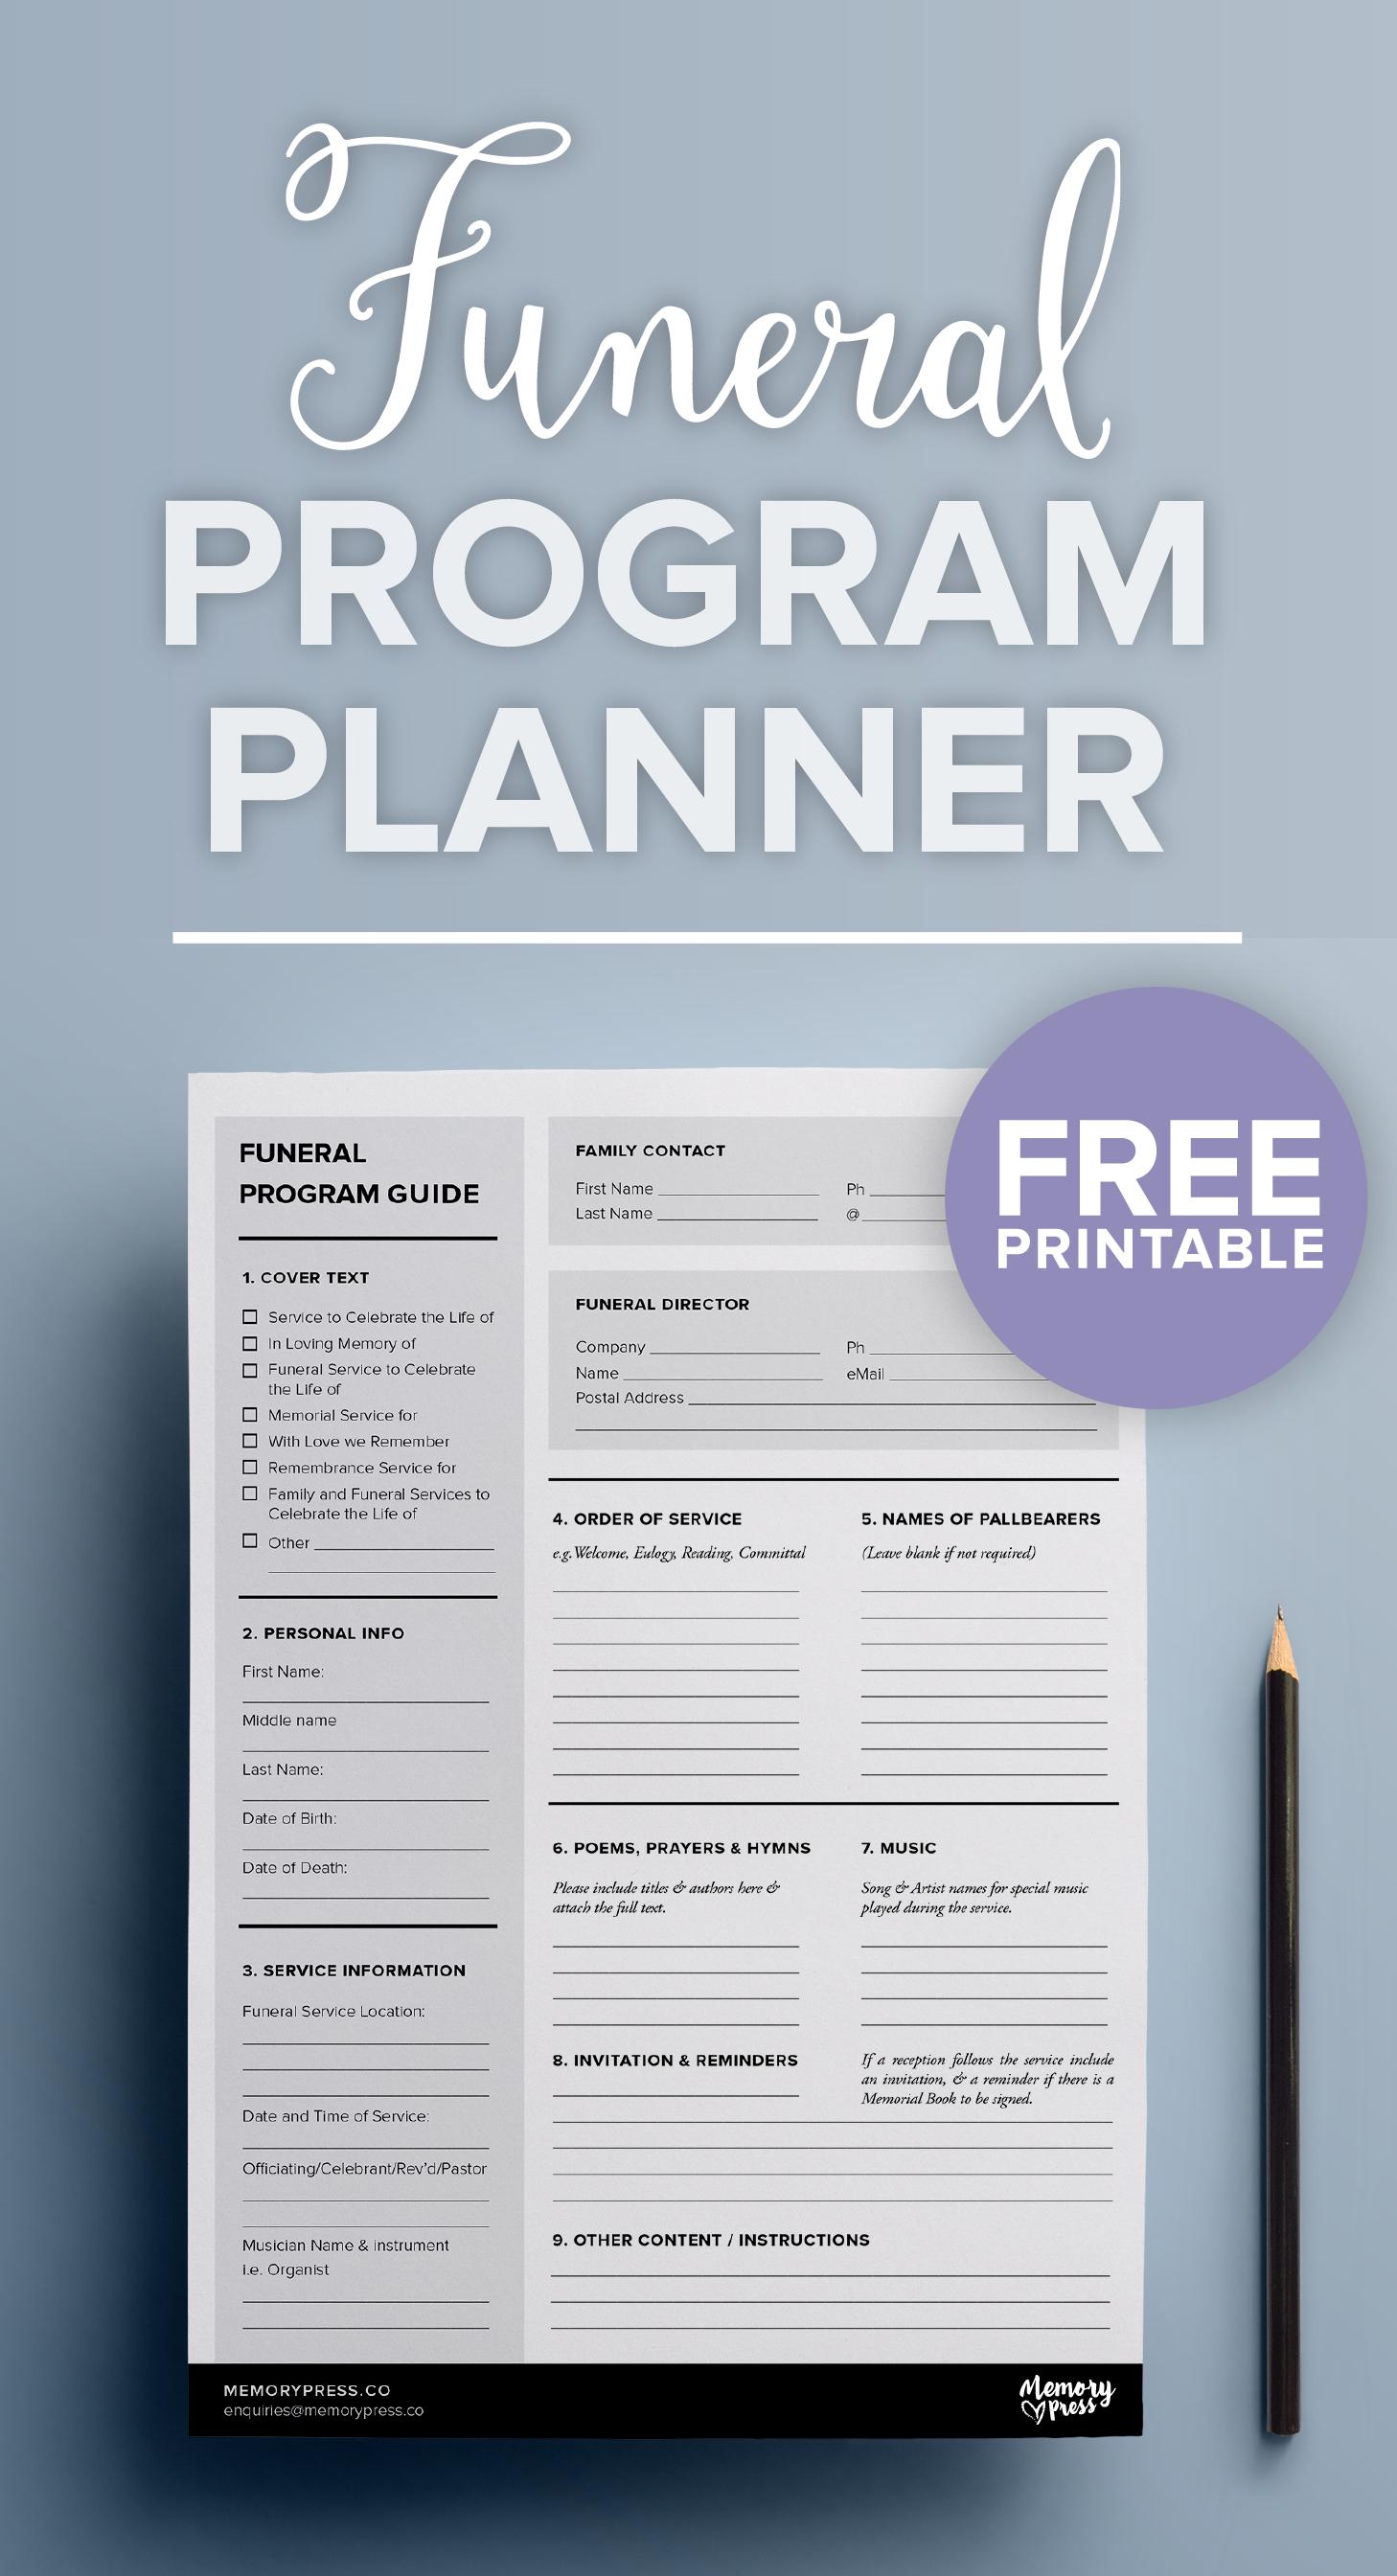 Free Printable Funeral Program Planner | Funeral Program Templates - Free Printable Funeral Program Template